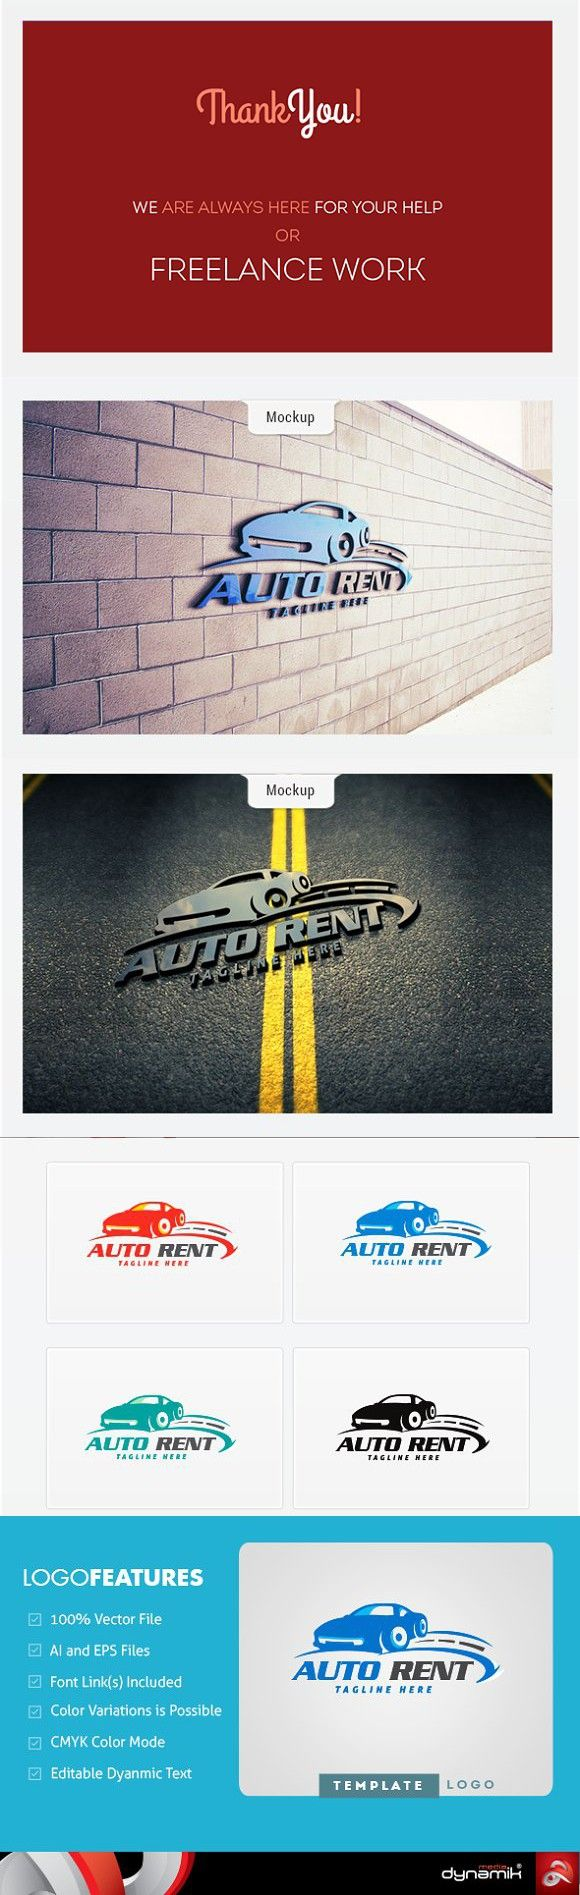 Auto Rent - Logo Template